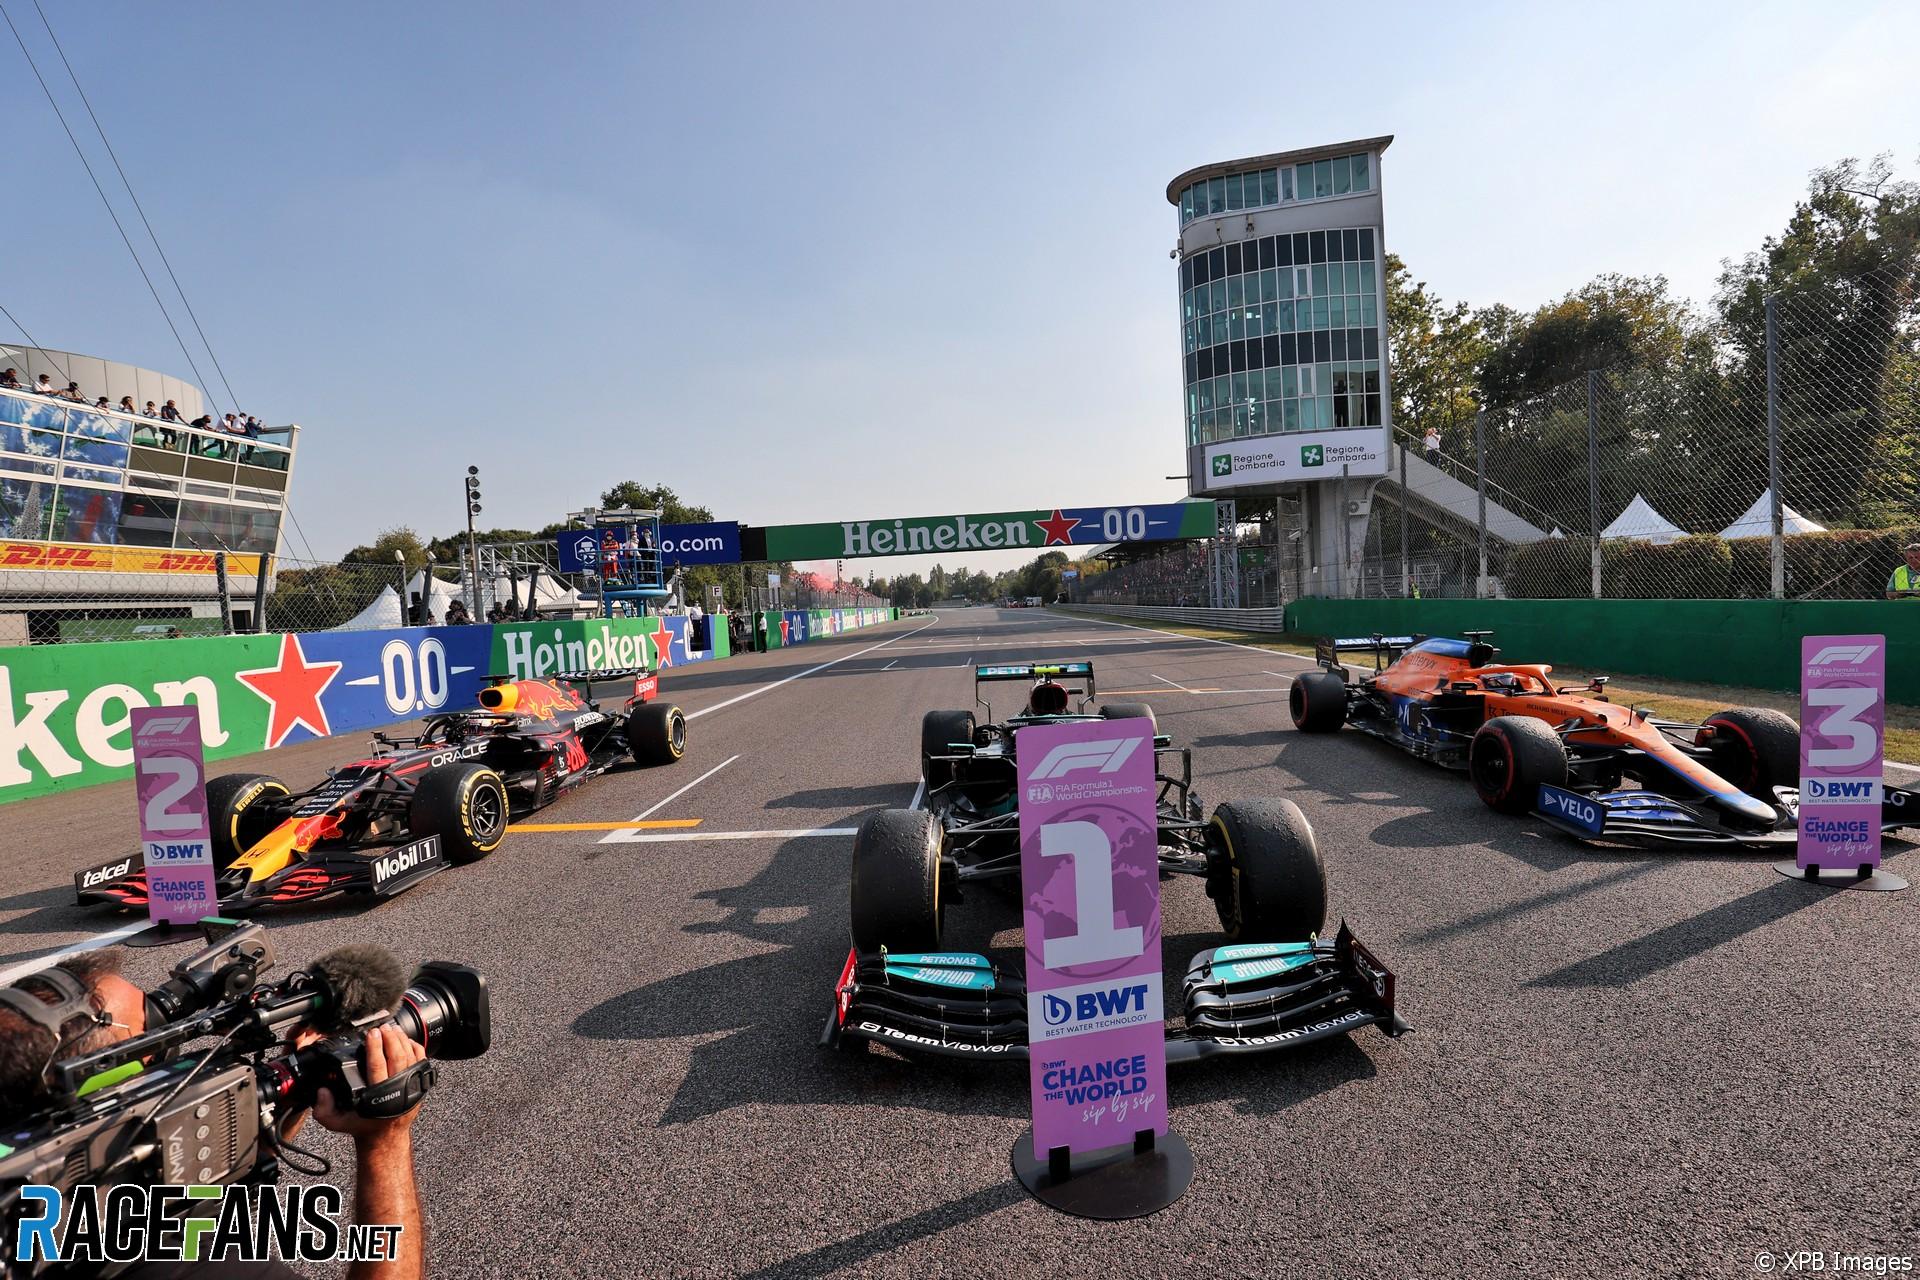 Max Verstappen, Red Bull, Monza, 2021